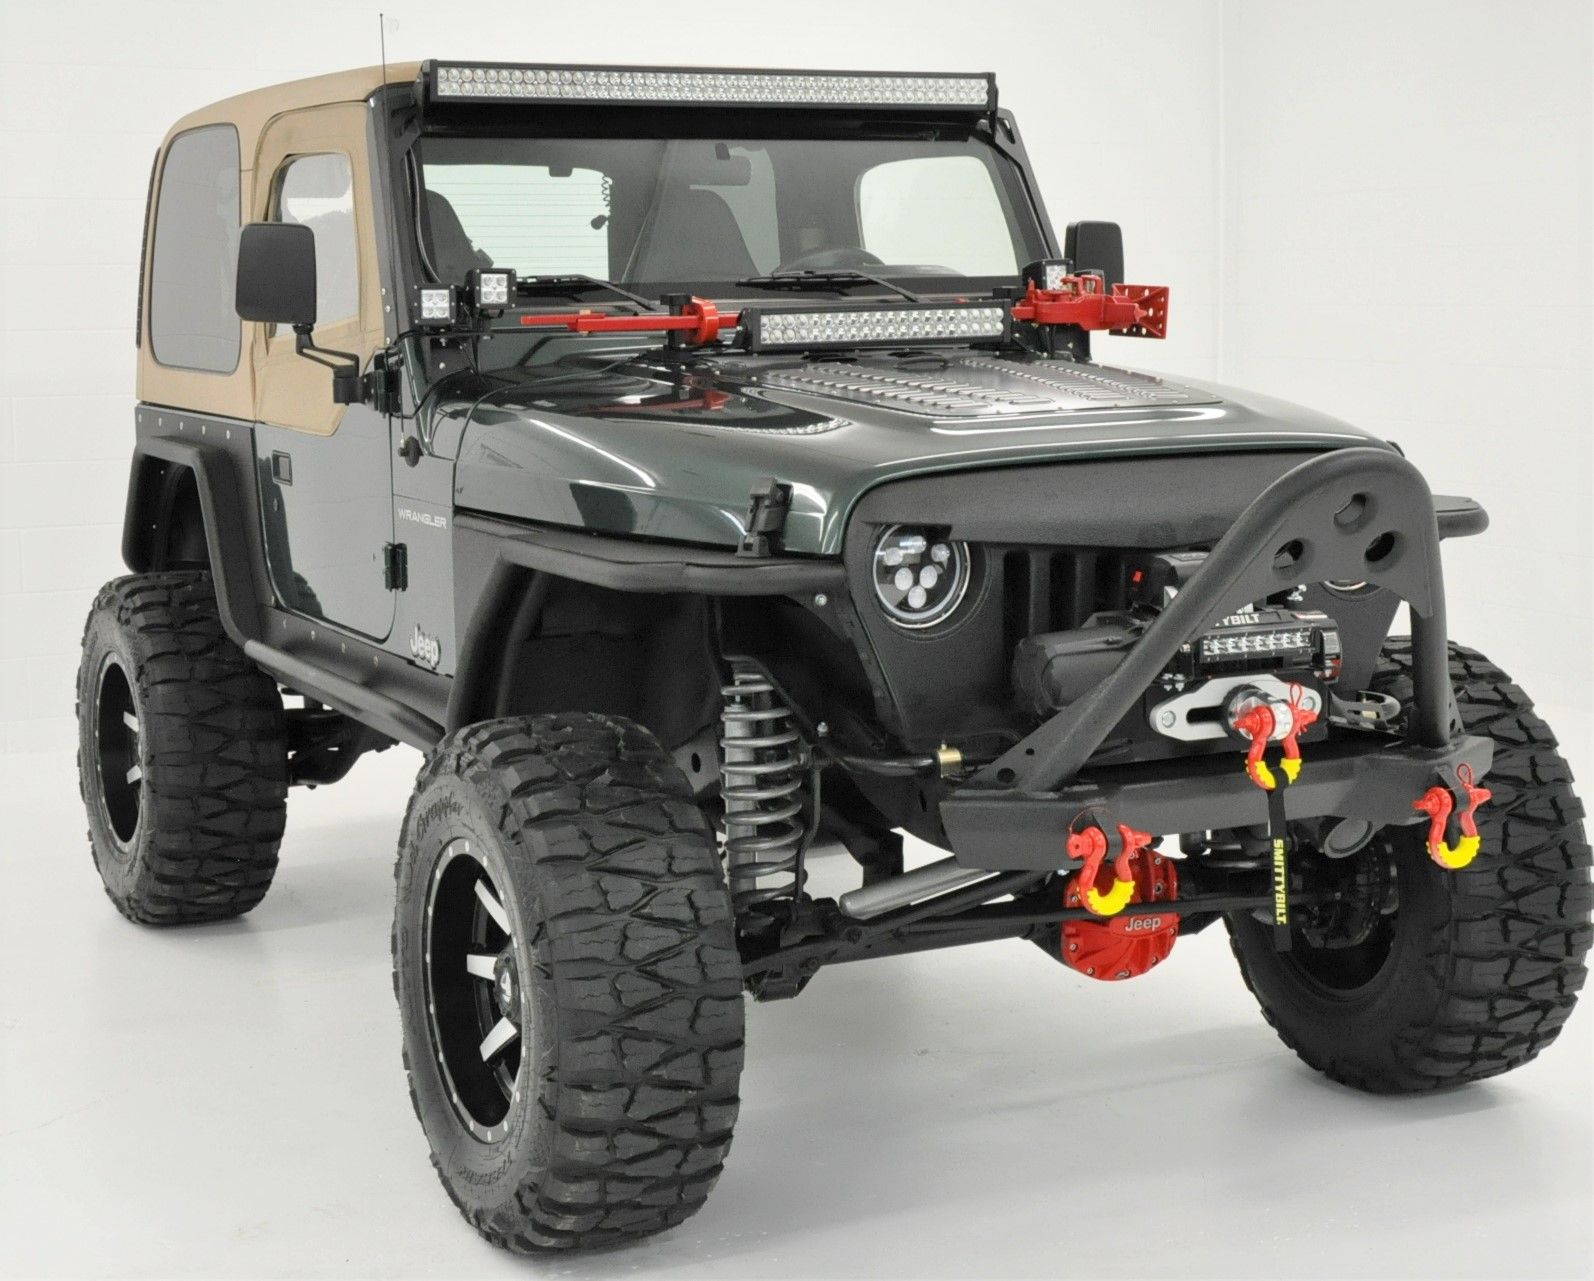 1999 Jeep Tj Wrangler Built By 7slotoffroad Com Custom Built Jeeps